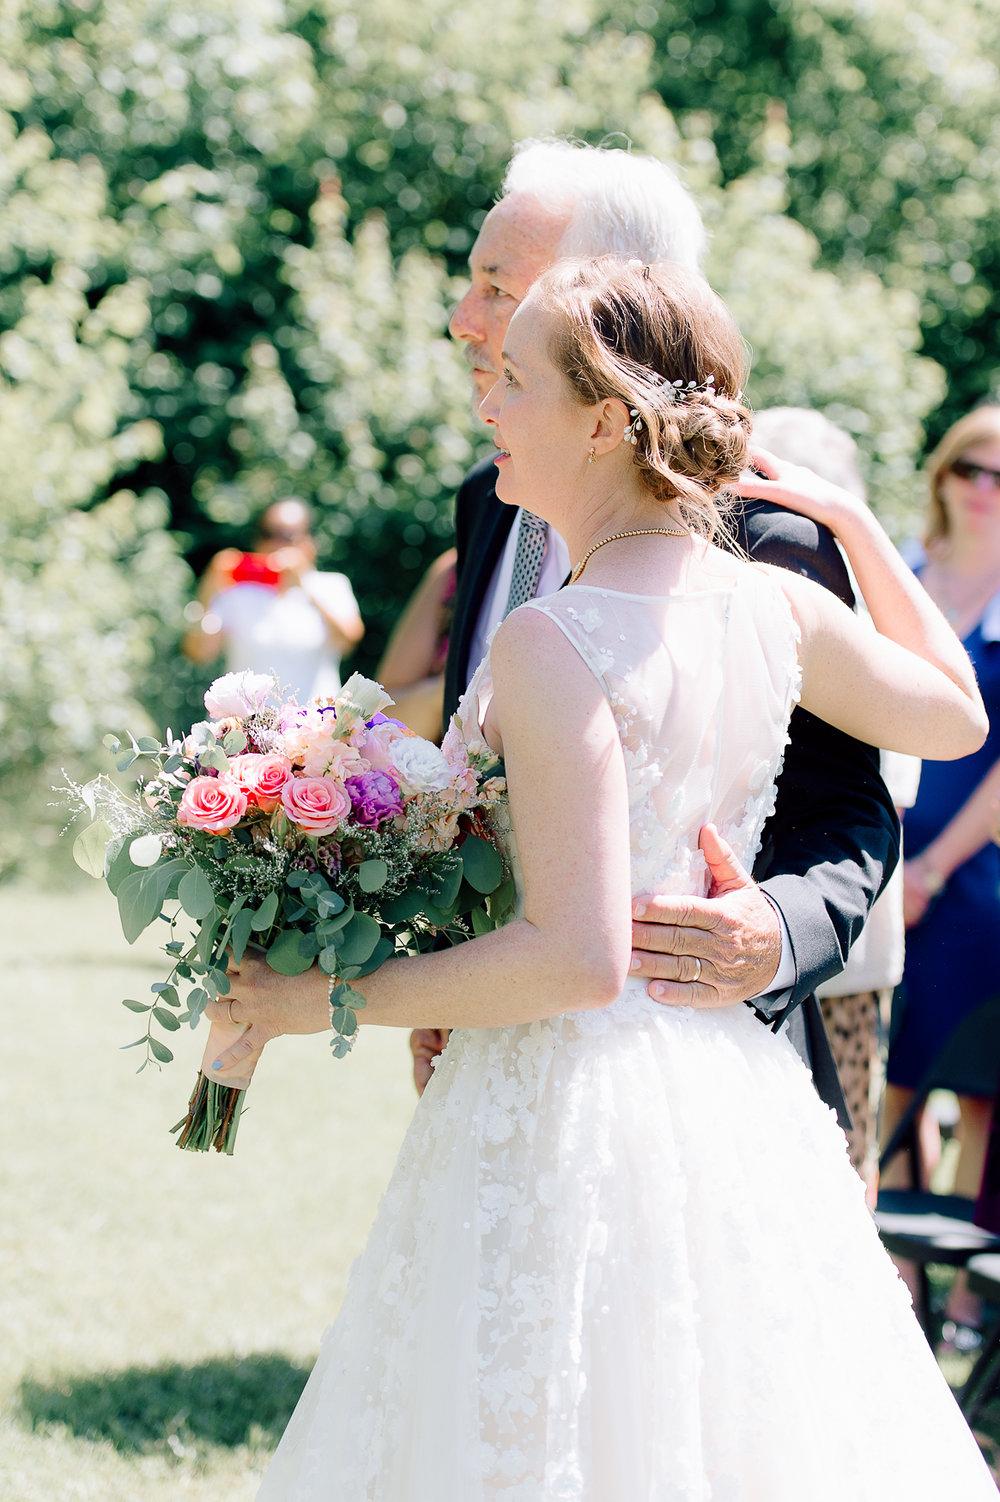 virginiawedding_theGlasgowFarm_rusticwedding_fredericksburg_youseephotography_CarolineDale (38).jpg